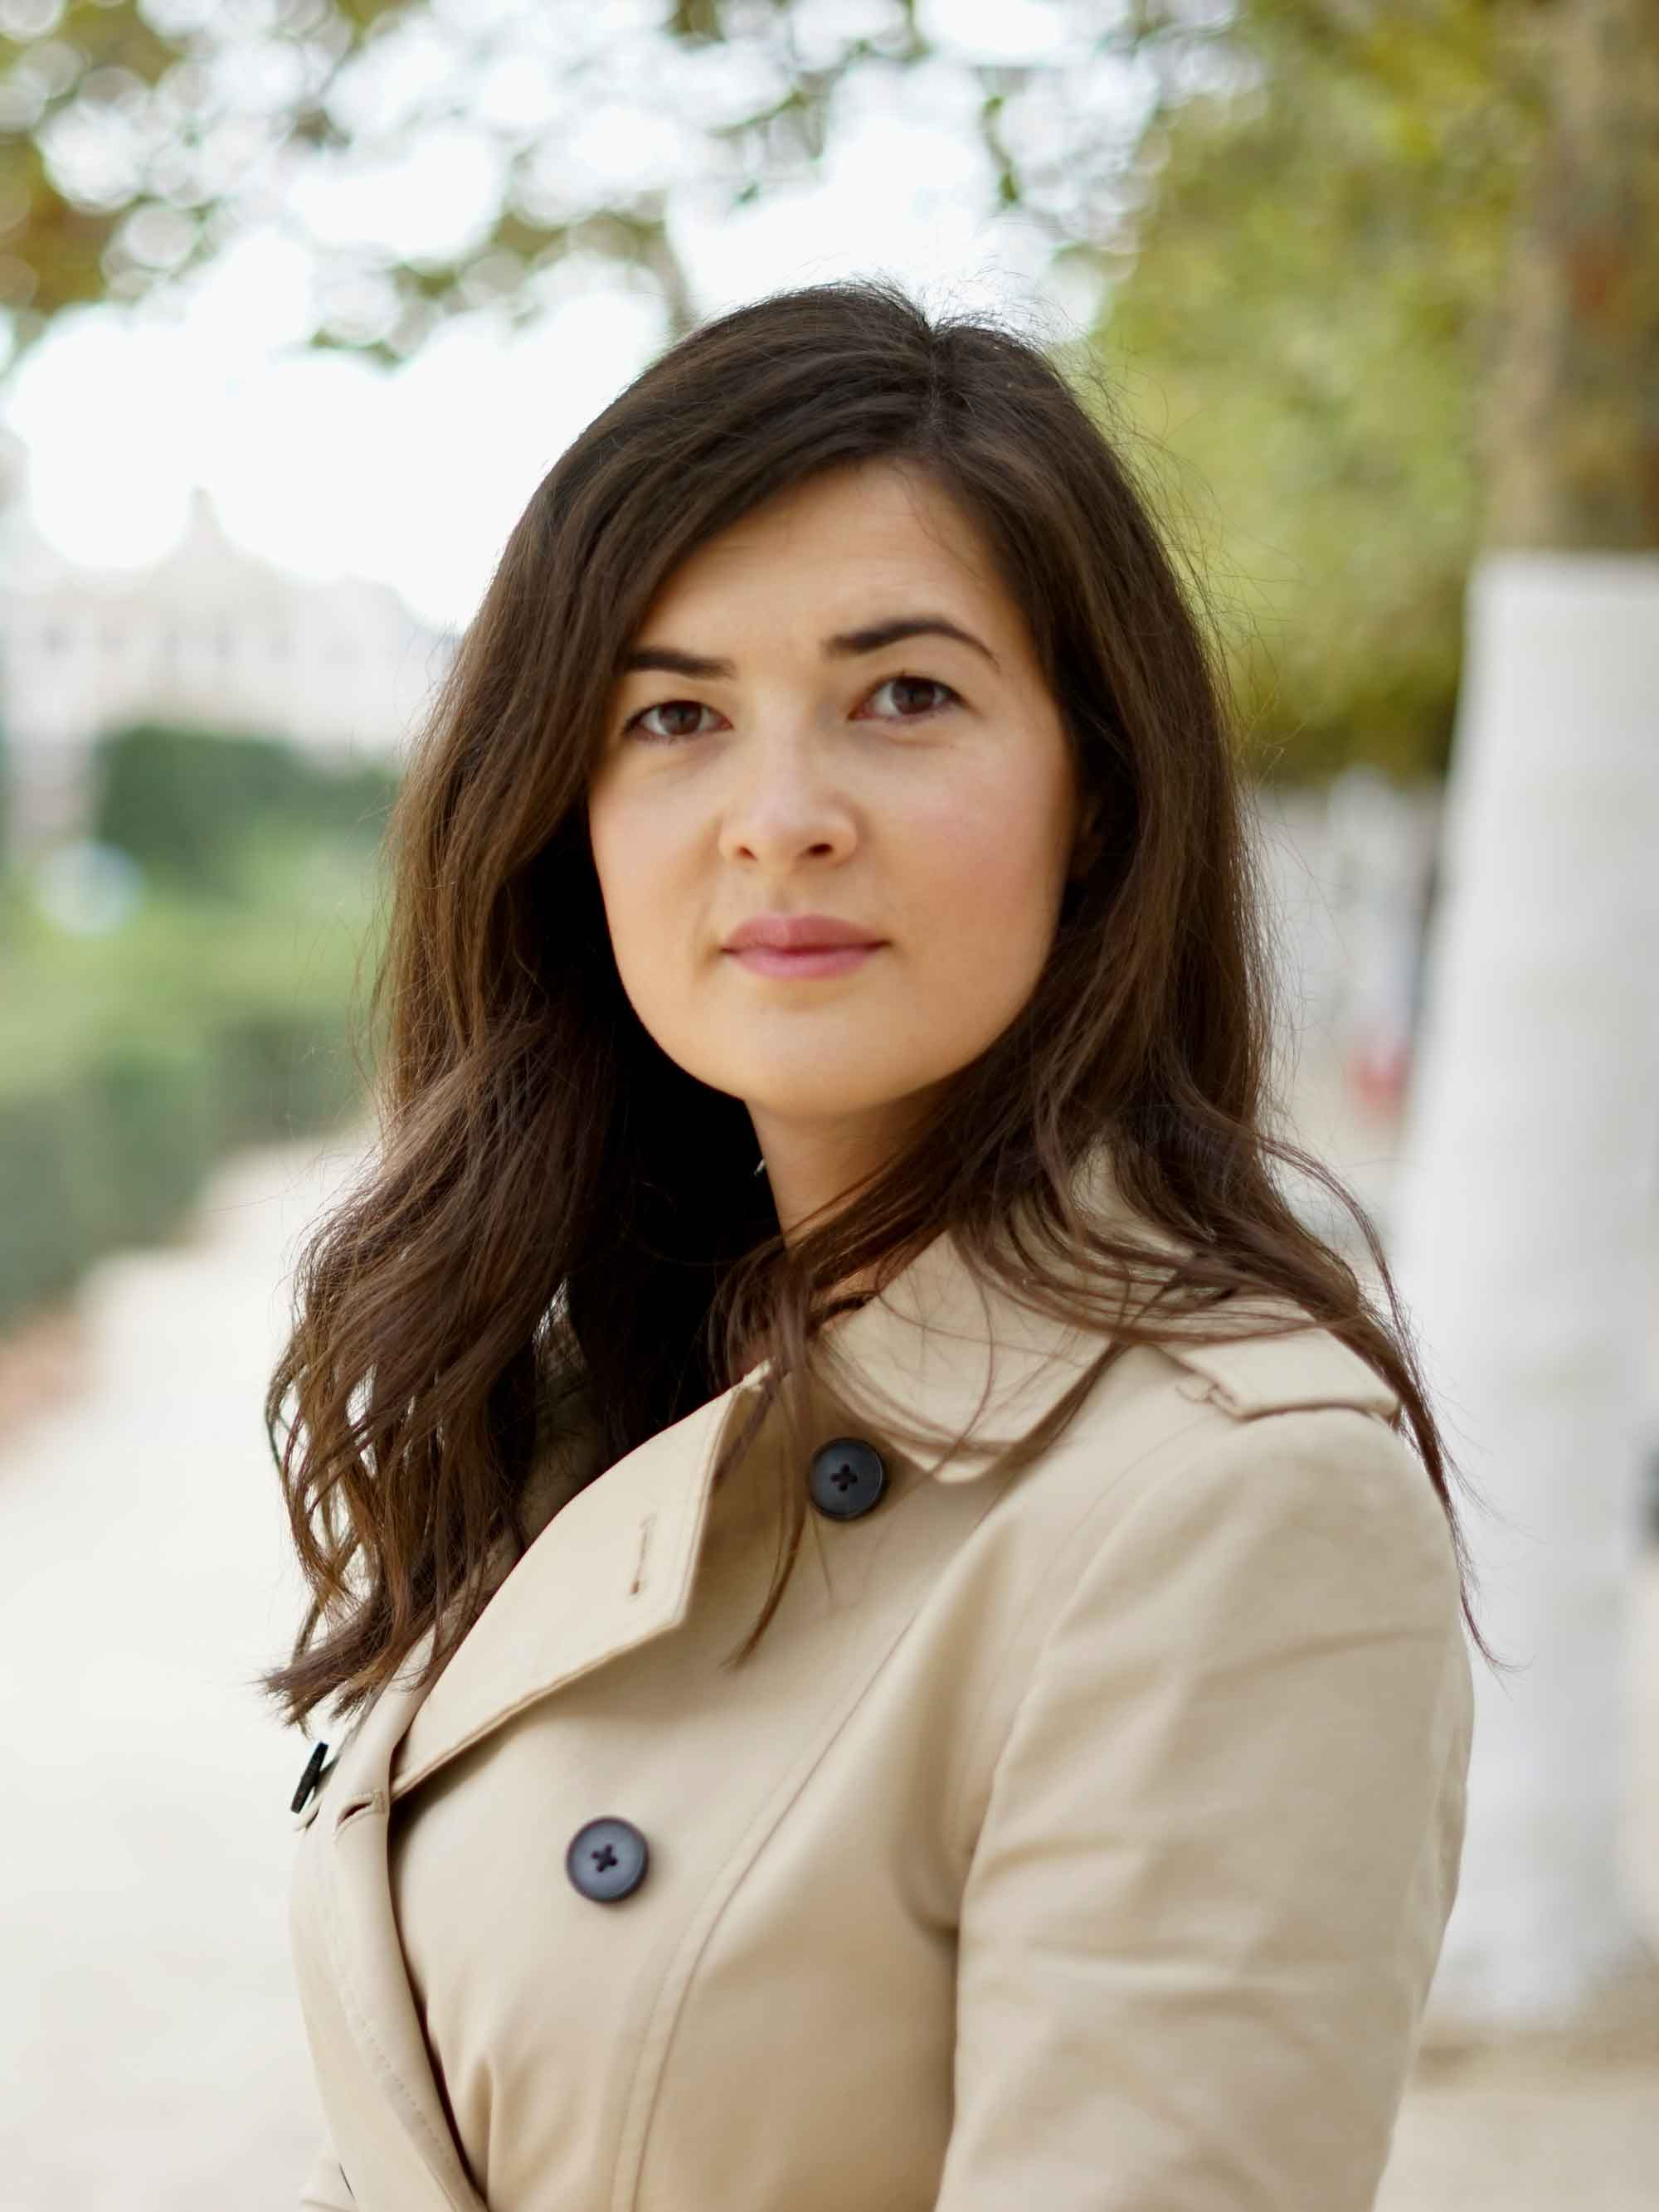 Daniela Petruneac